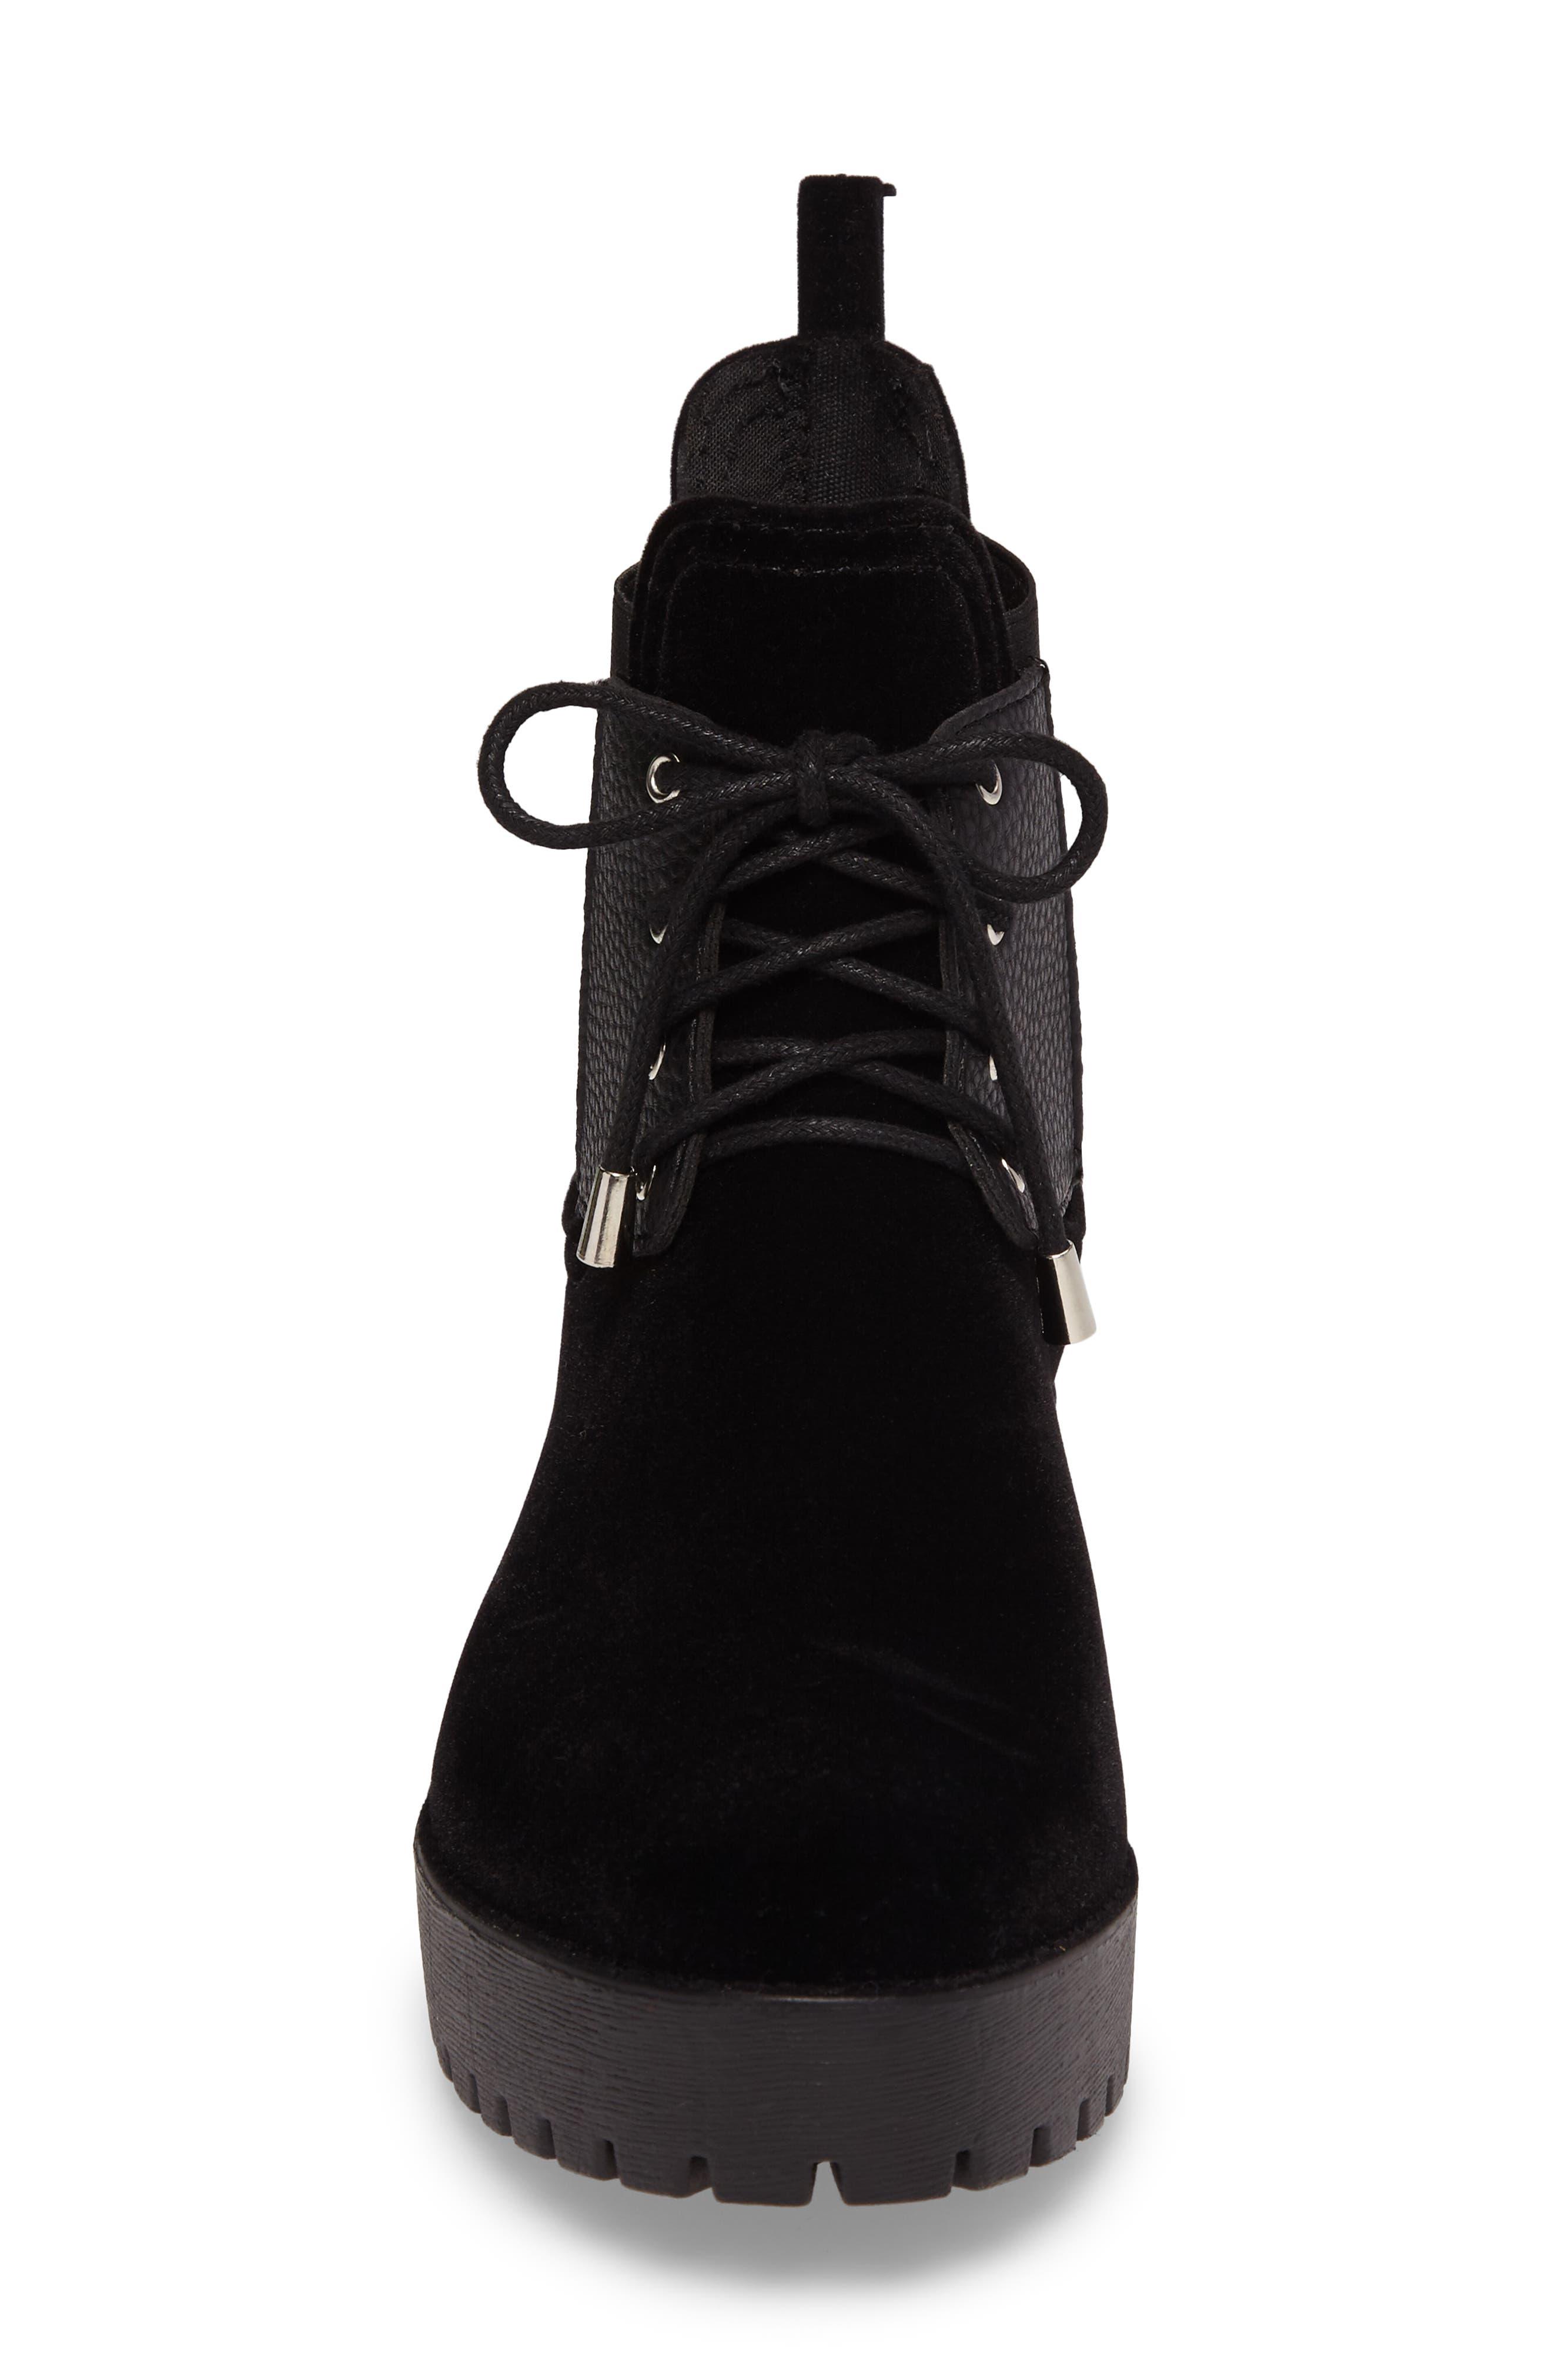 Leeds Lace-Up Waterproof Boot,                             Alternate thumbnail 4, color,                             BLACK